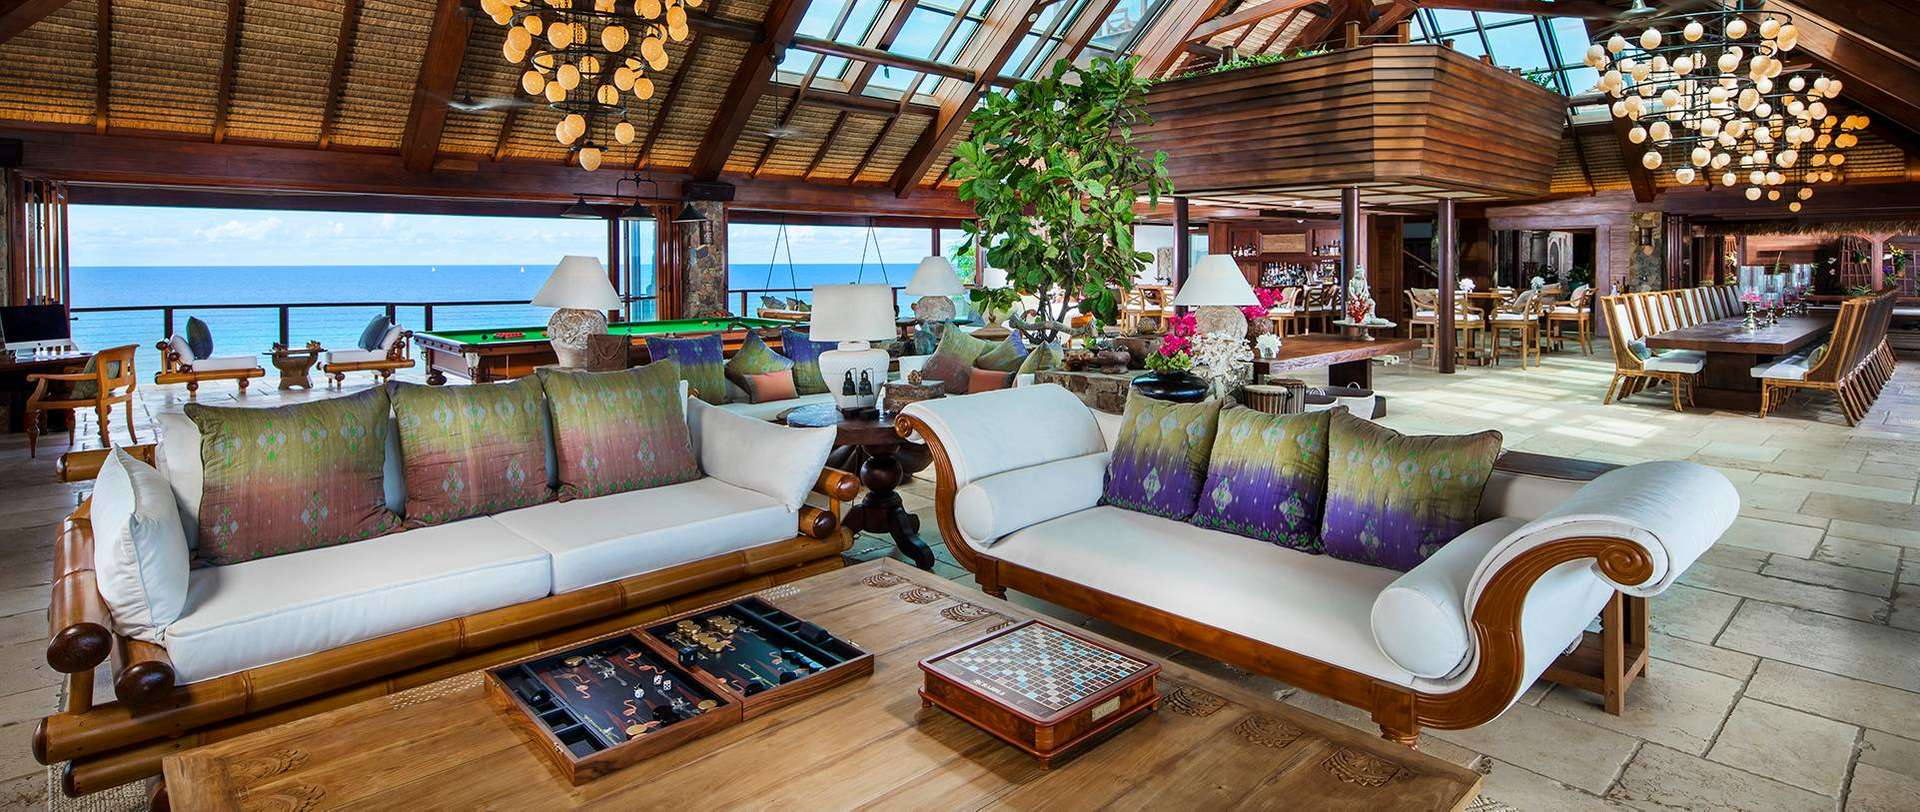 Luxury villa rentals caribbean - British virgin islands - Necker island - Great House | Guest House Suites | Necker Island - Image 1/11